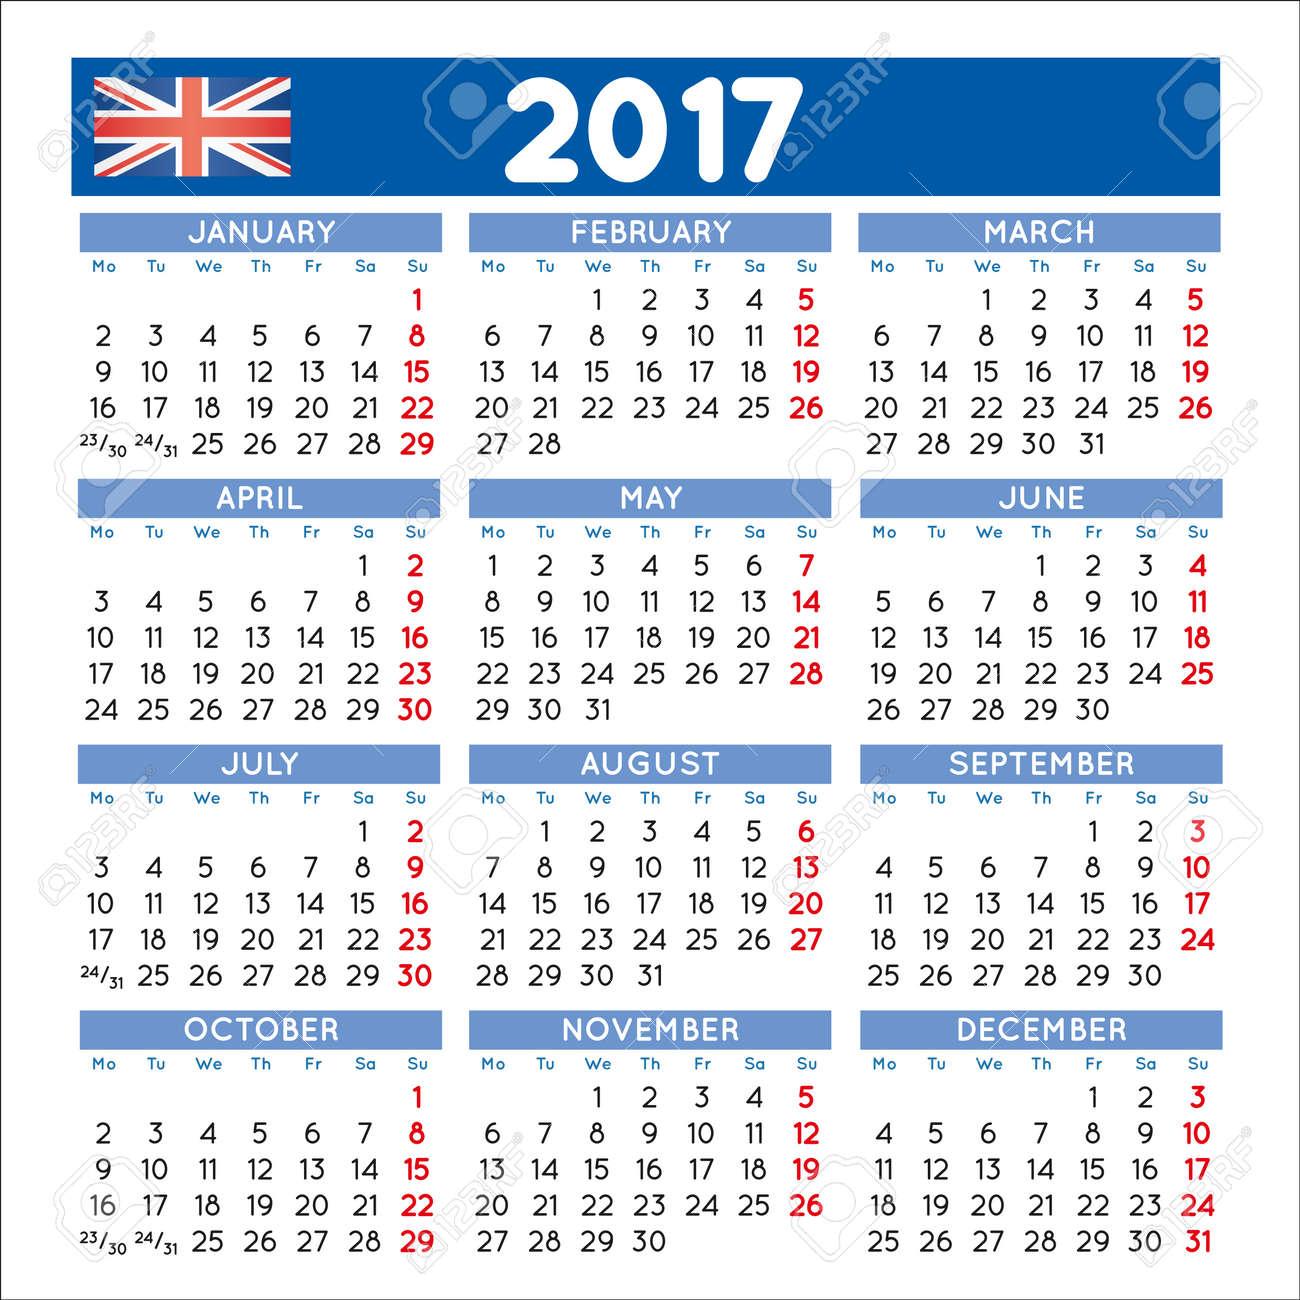 Calendar 2017 File easy